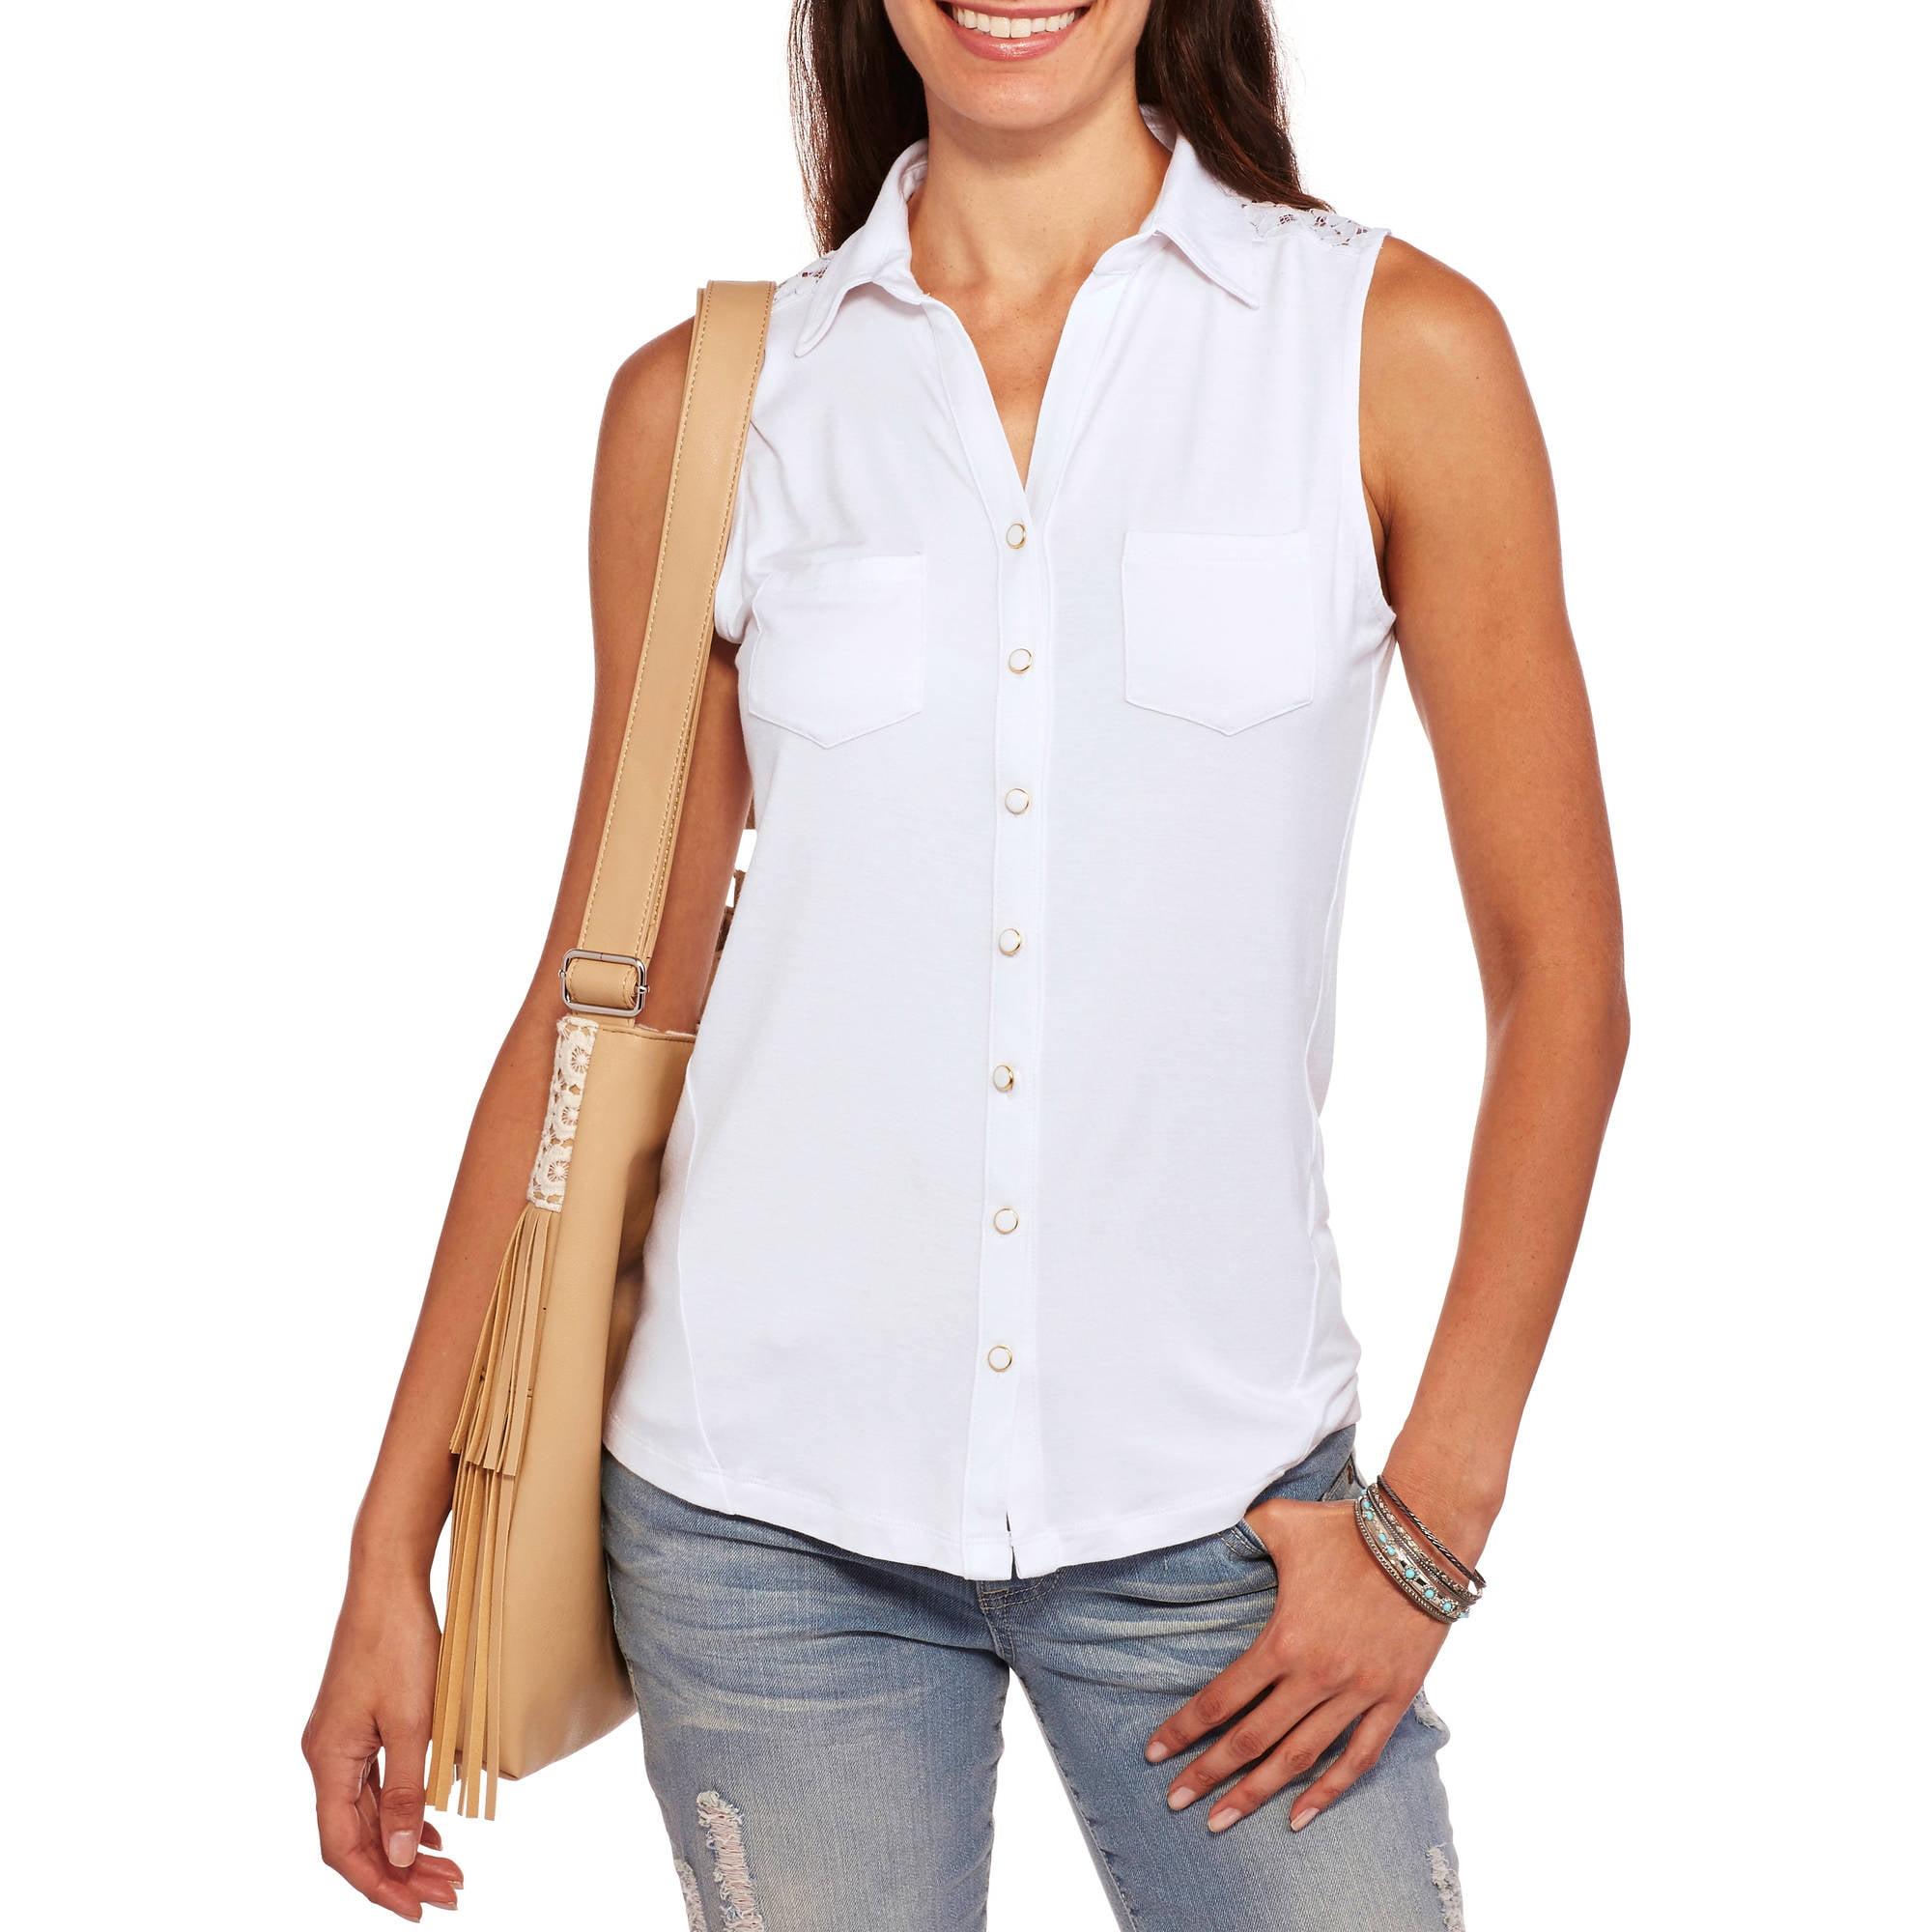 Brooke Leigh Women's Lace Back Sleeveless Shirt Blouse